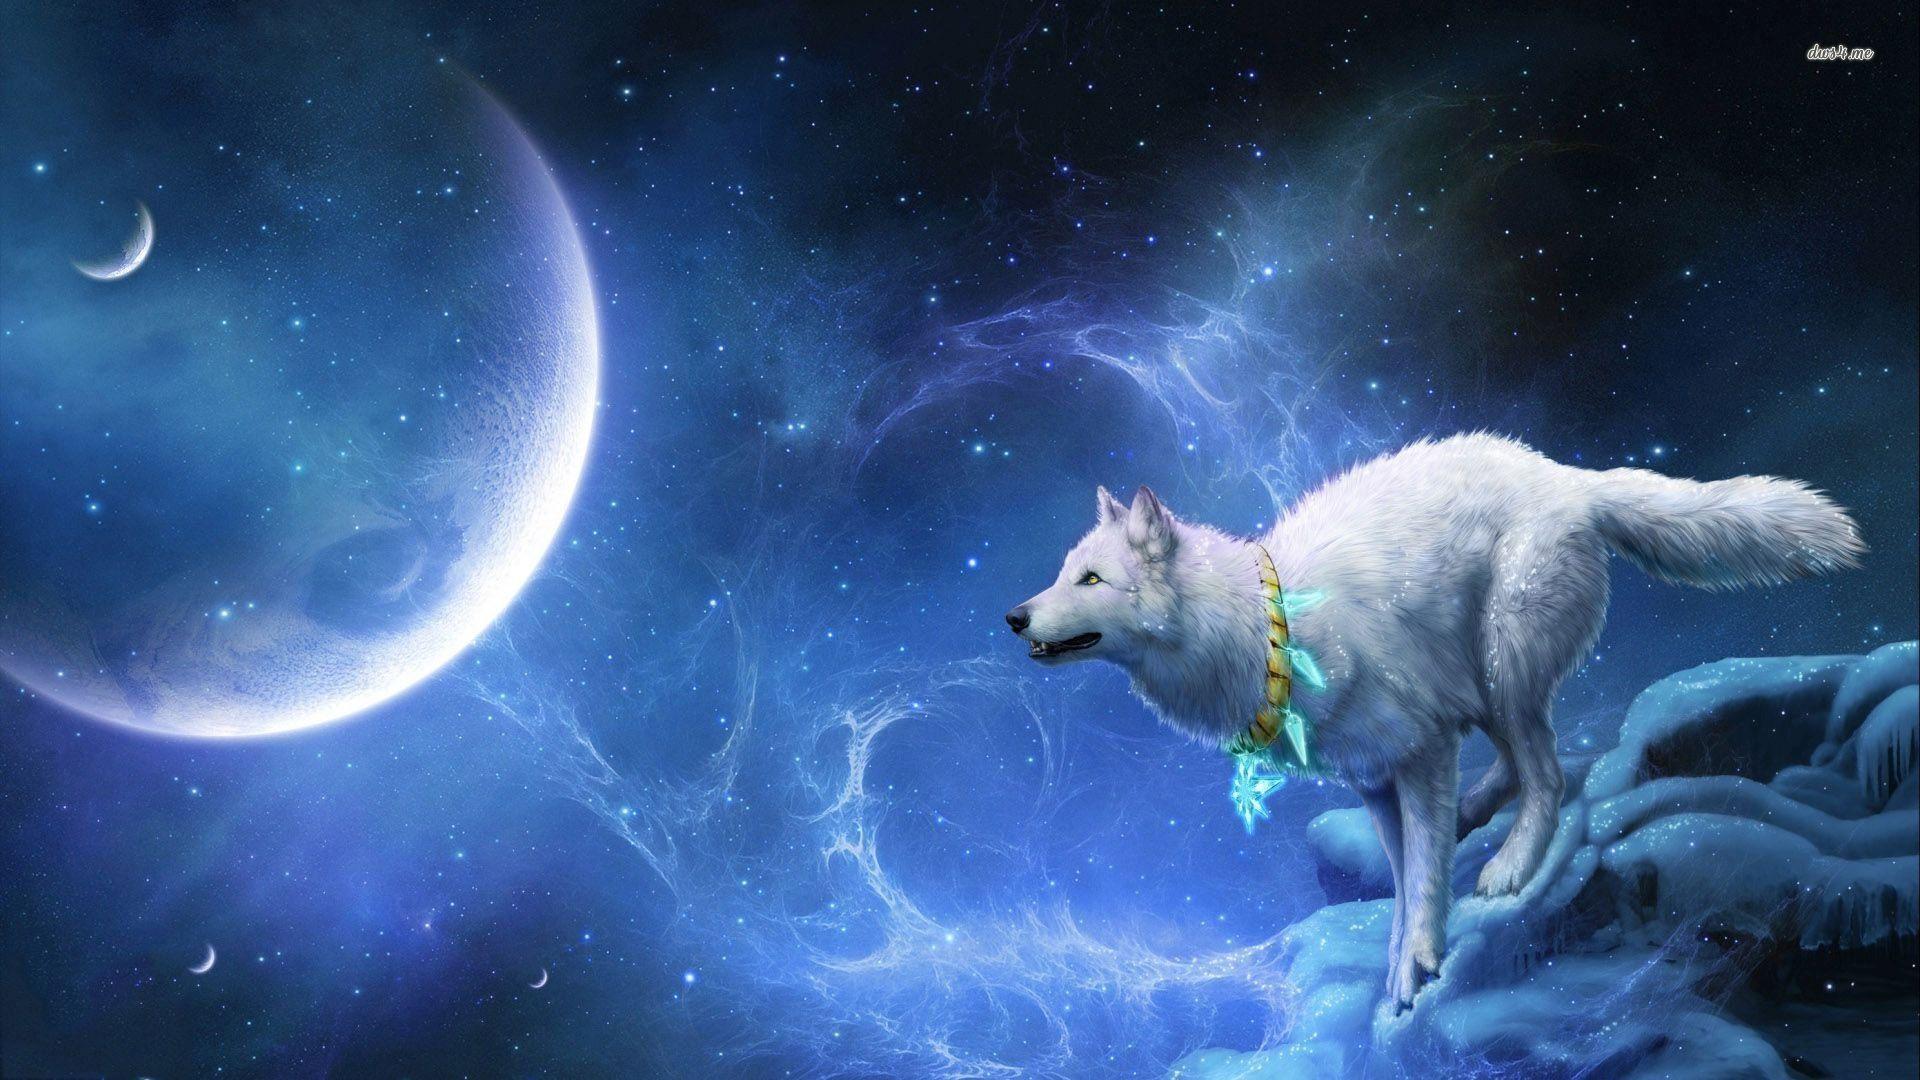 blue moon wolf wallpaper - photo #21